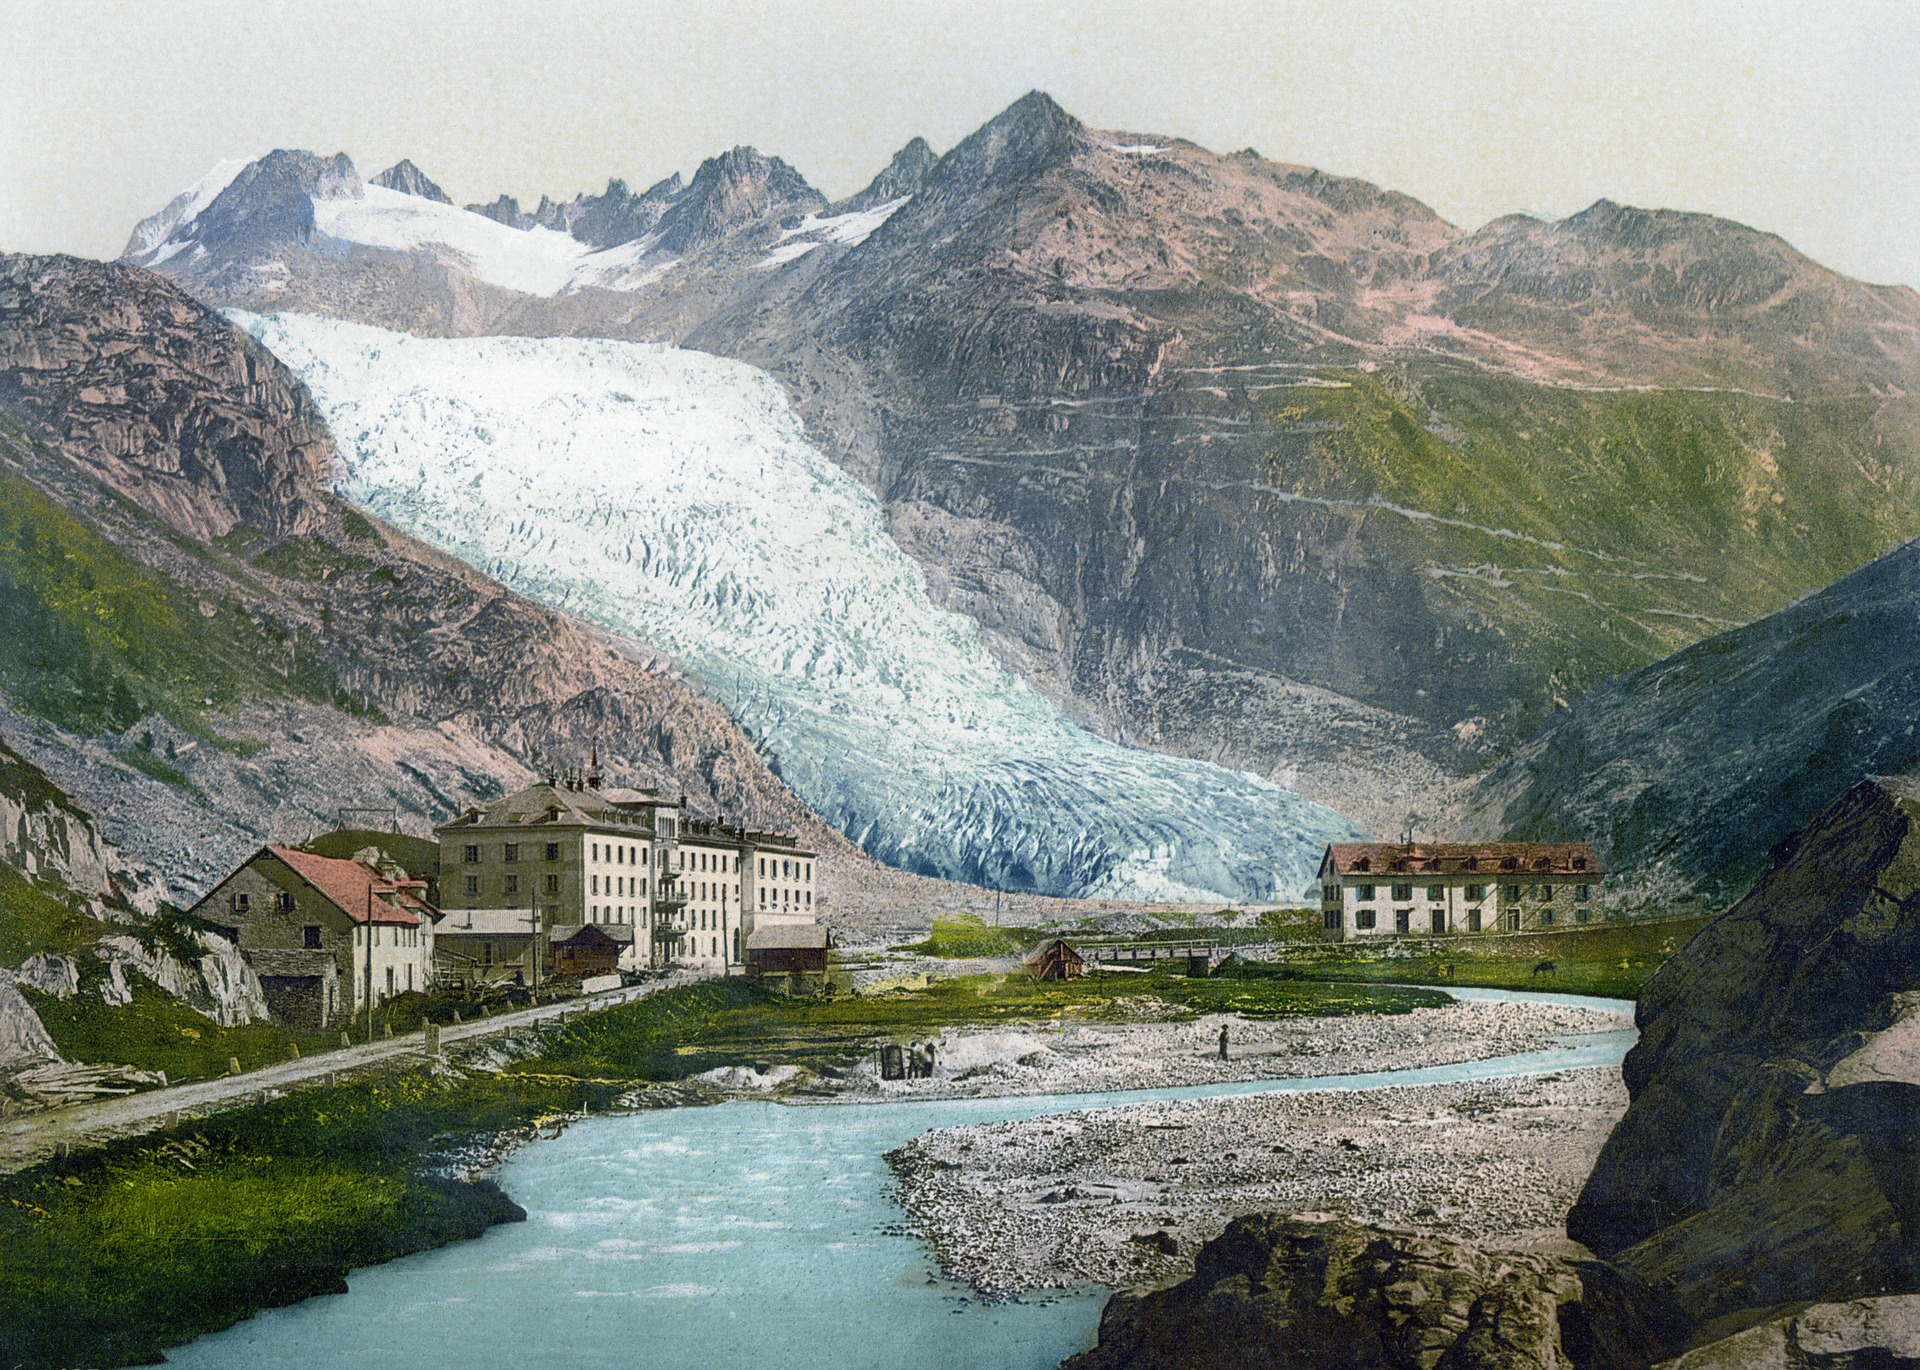 rhone-glacier-1234339_1920.jpg